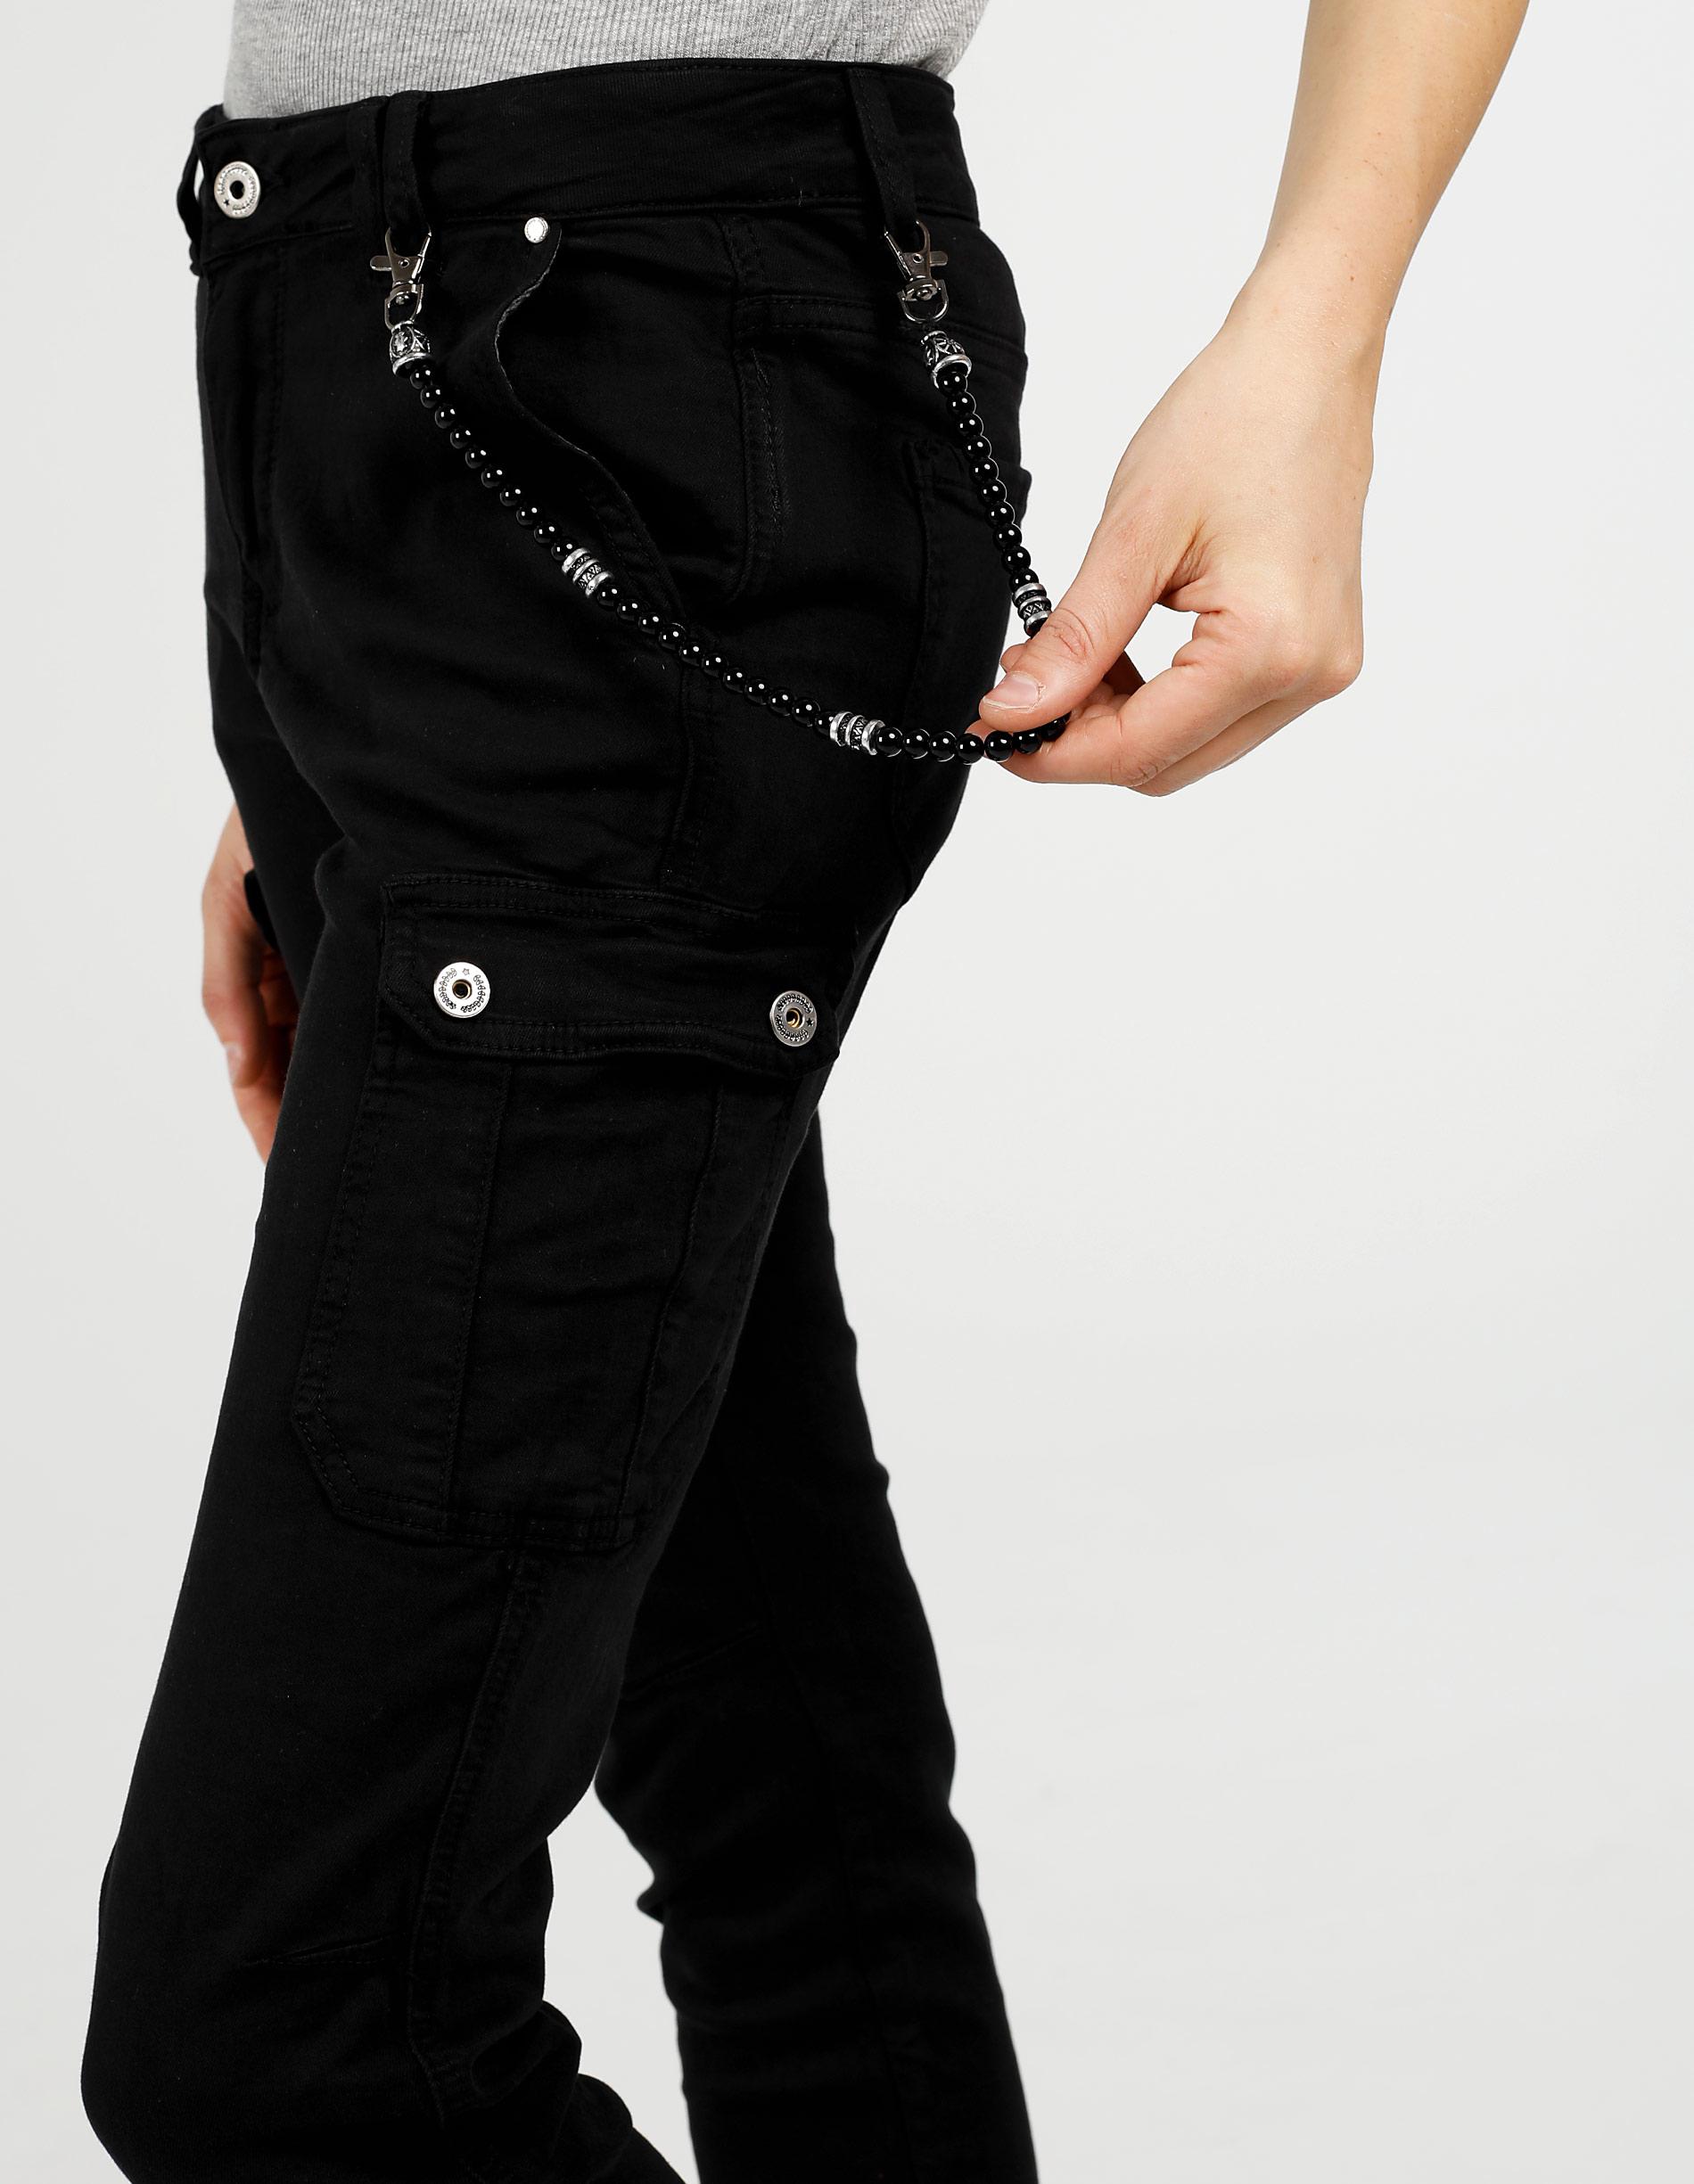 Spodnie - 70-3092 NERO - Unisono